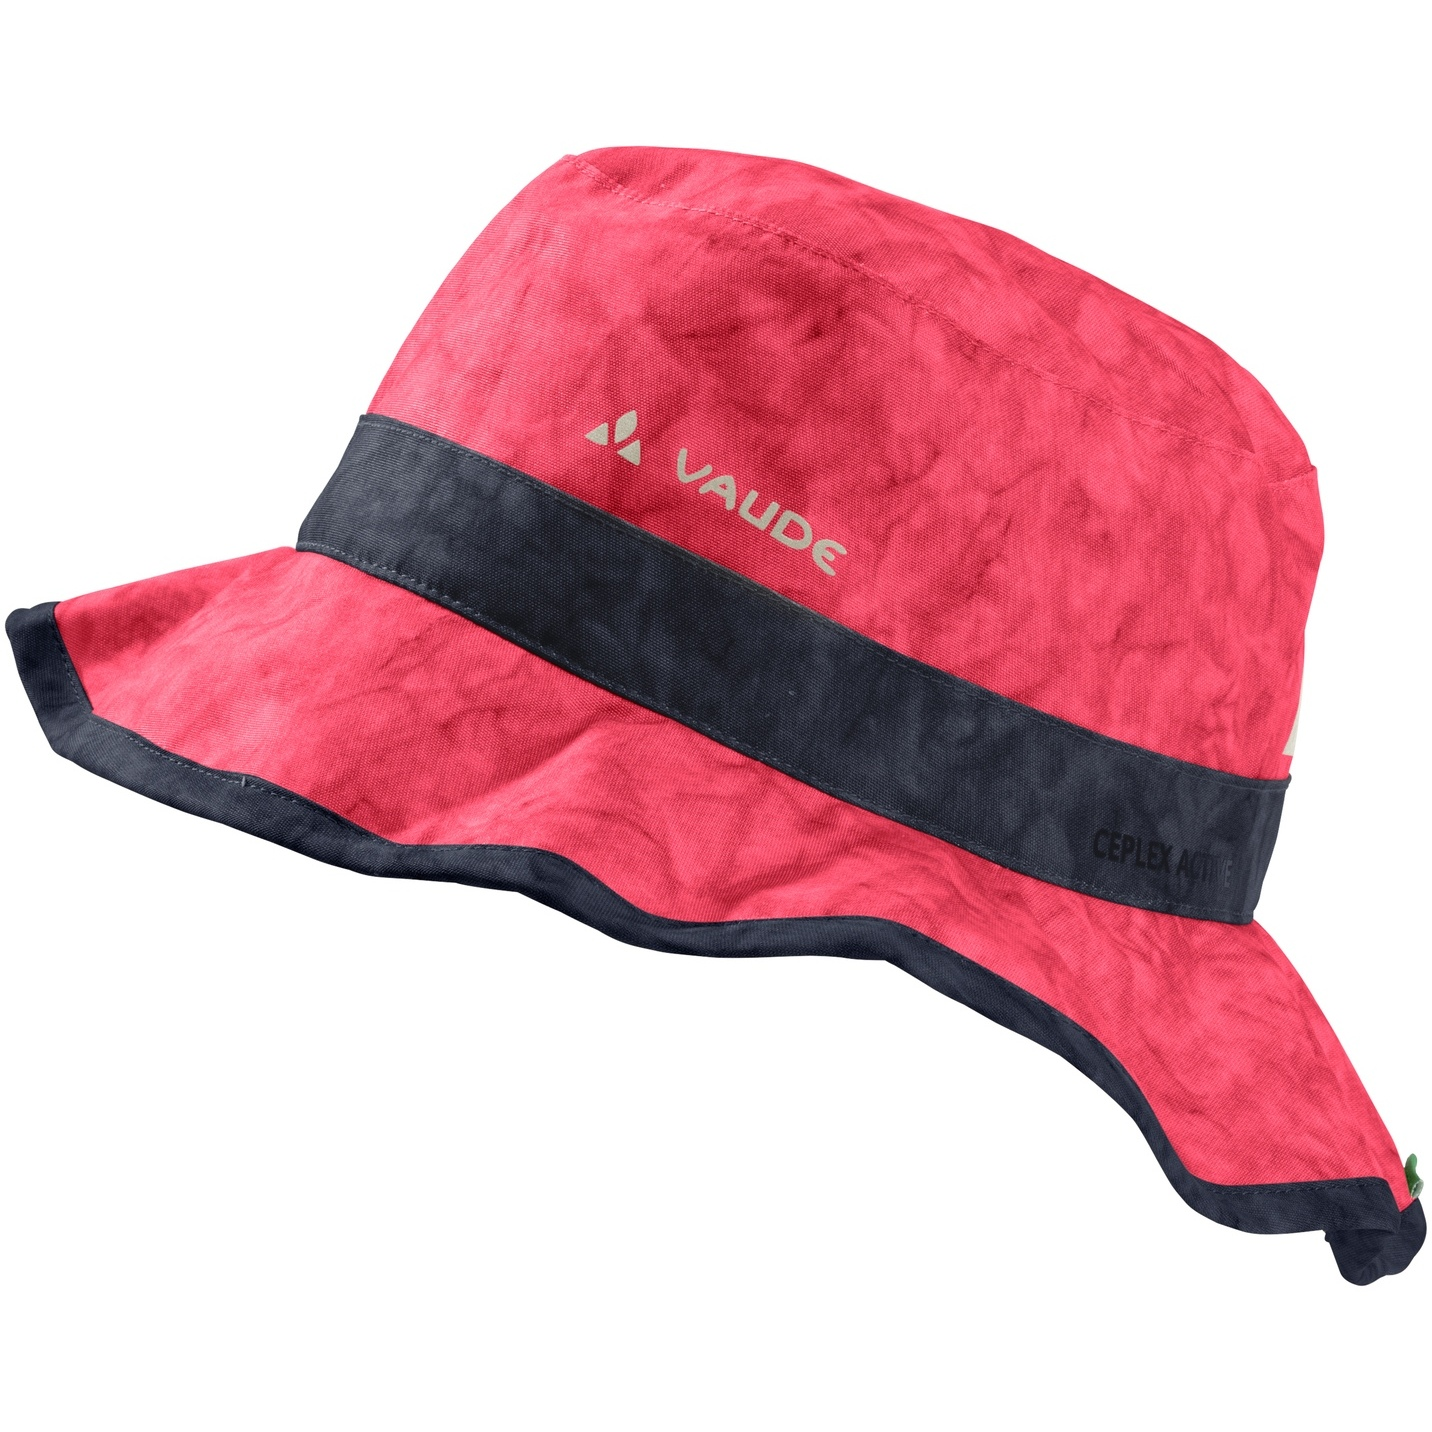 Vaude Kids Faunus Regen Hut - bright pink